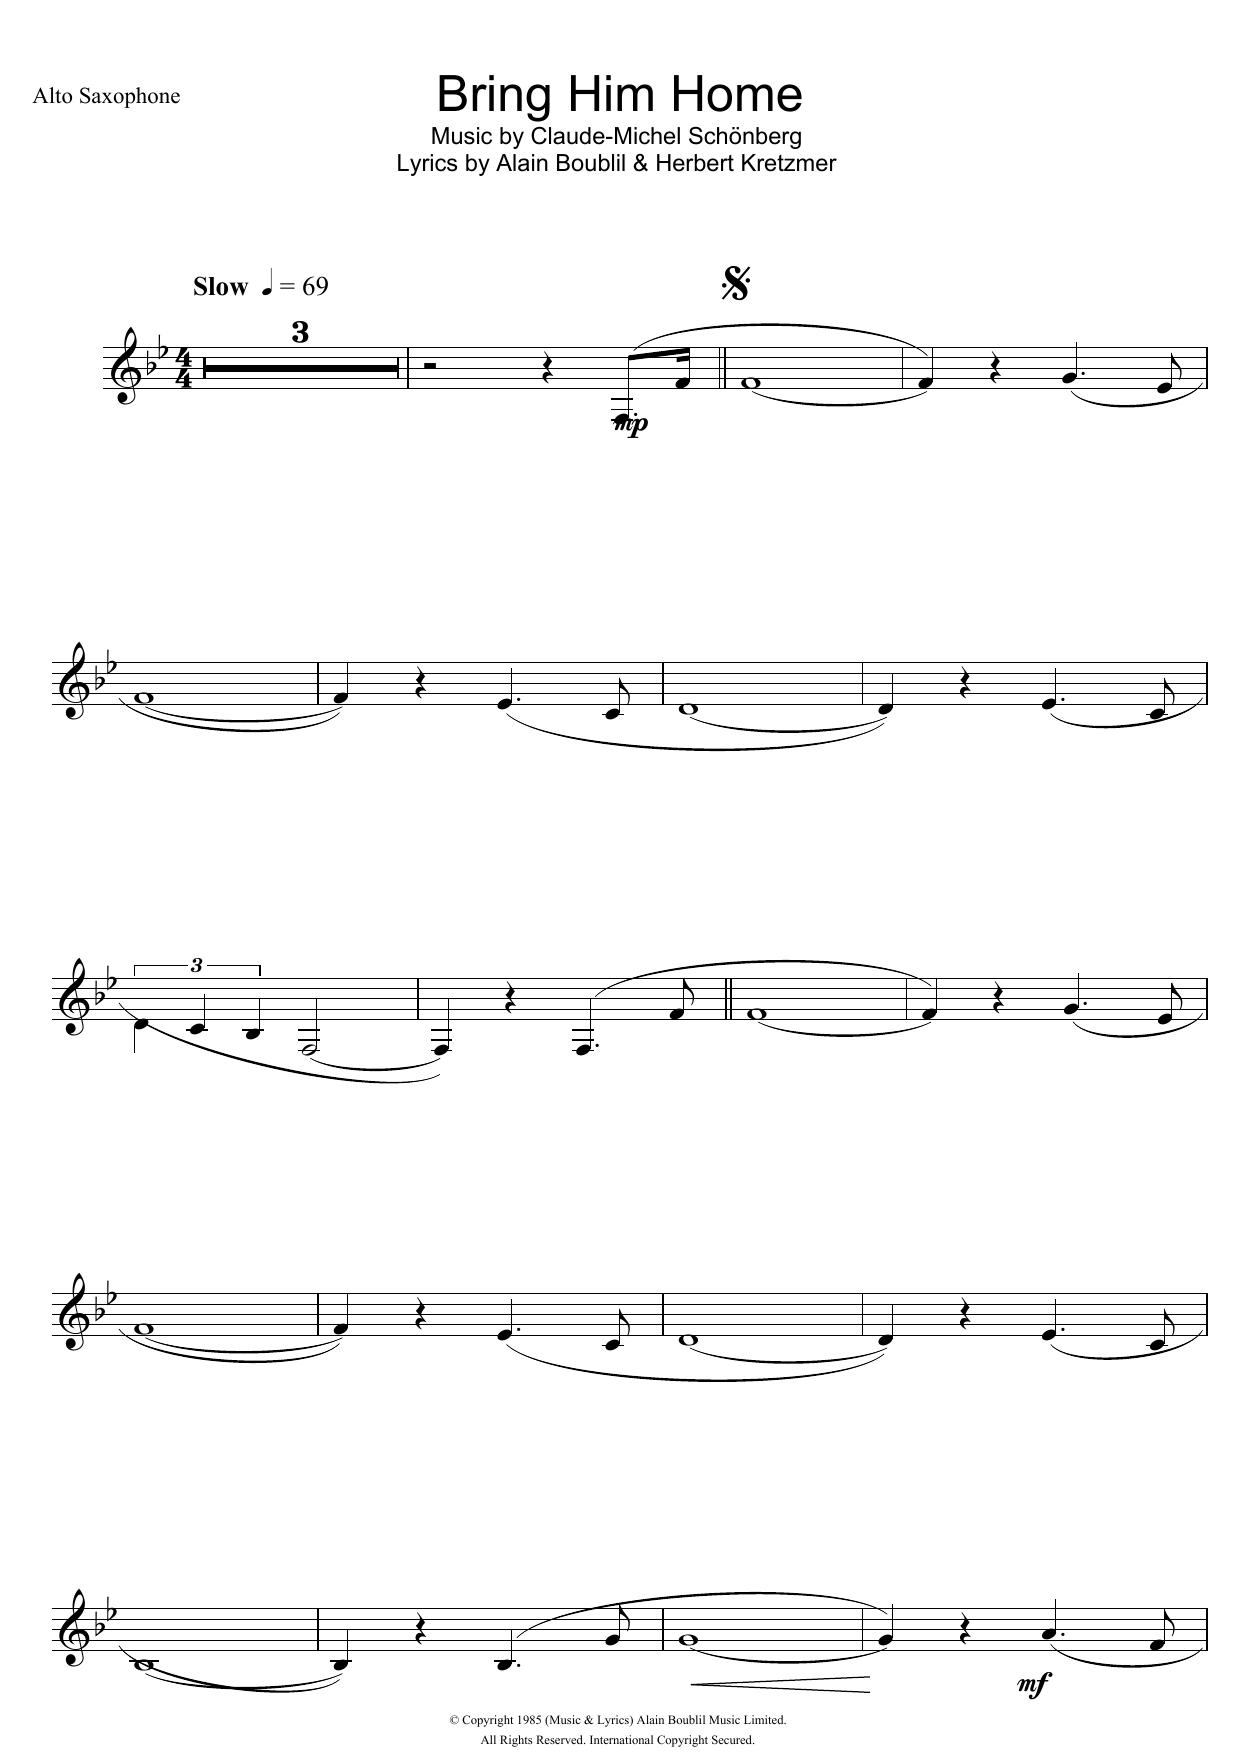 Sheet Music Digital Files To Print Licensed Claude Michel